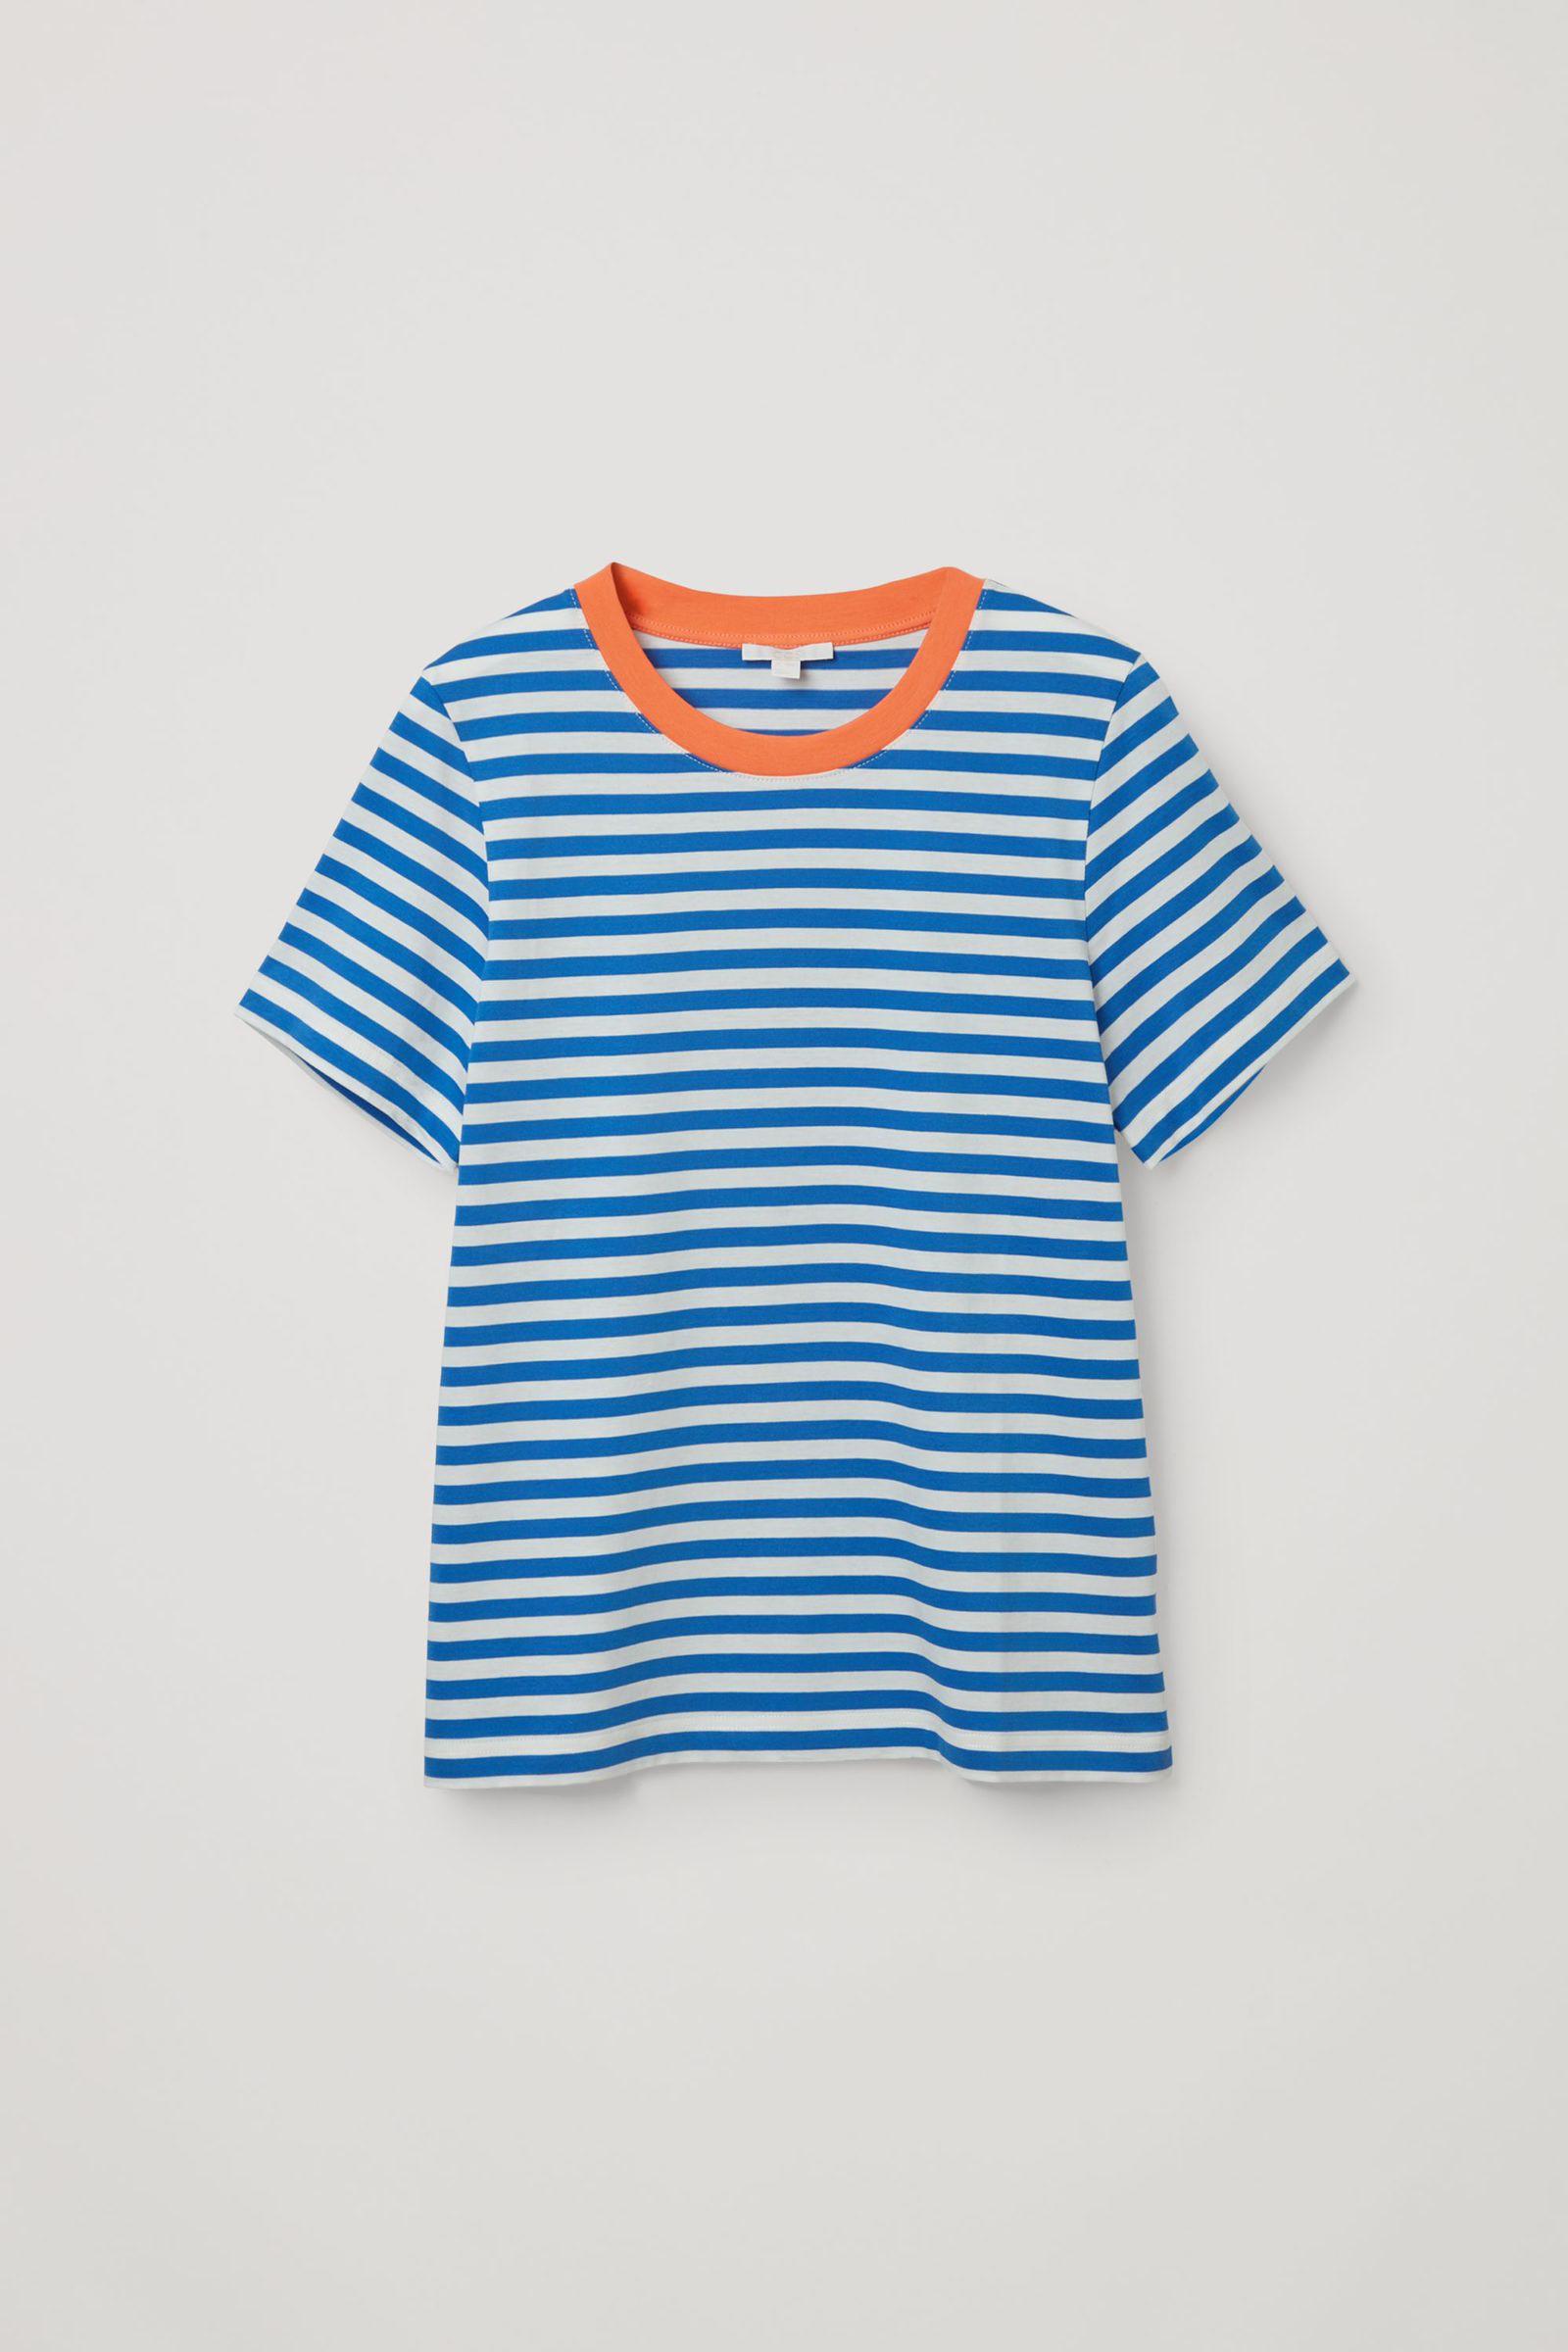 COS 코튼 저지 티셔츠의 화이트 / 블루컬러 Product입니다.